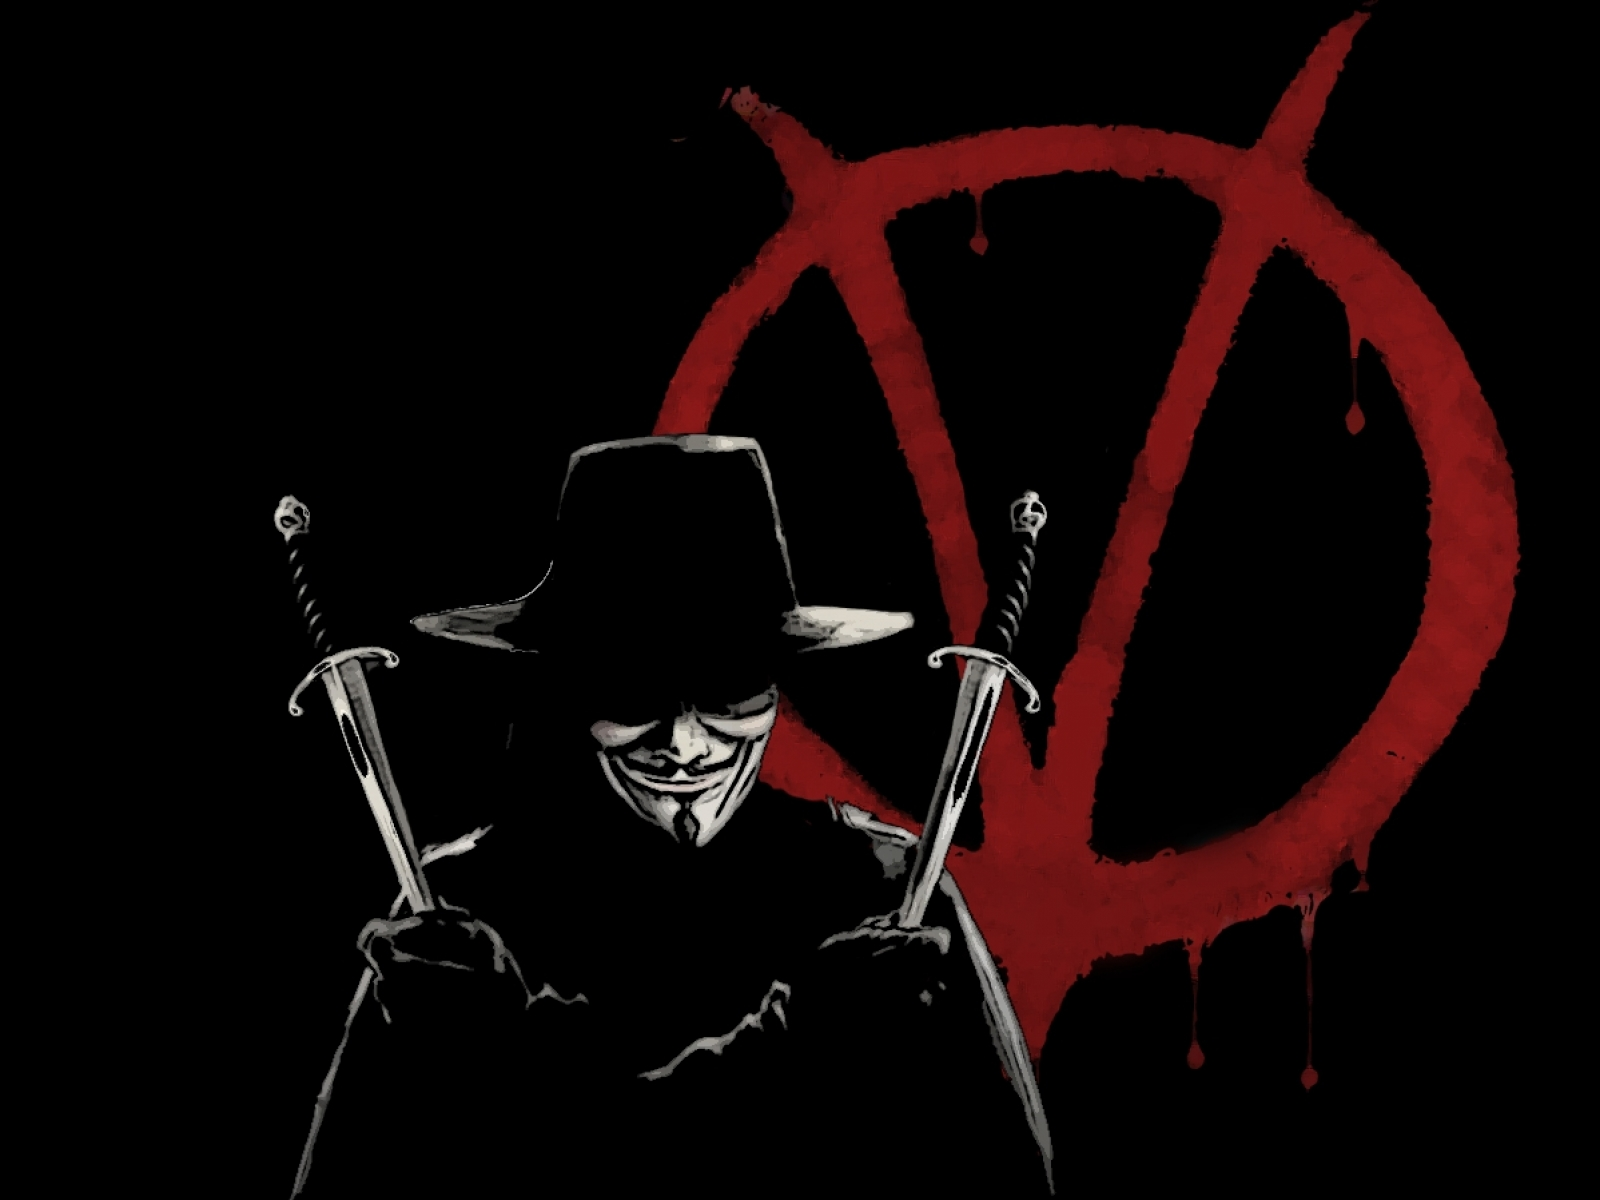 HD V For Vendetta Wallpaper High Definition Wallpapers Stock 1600x1200